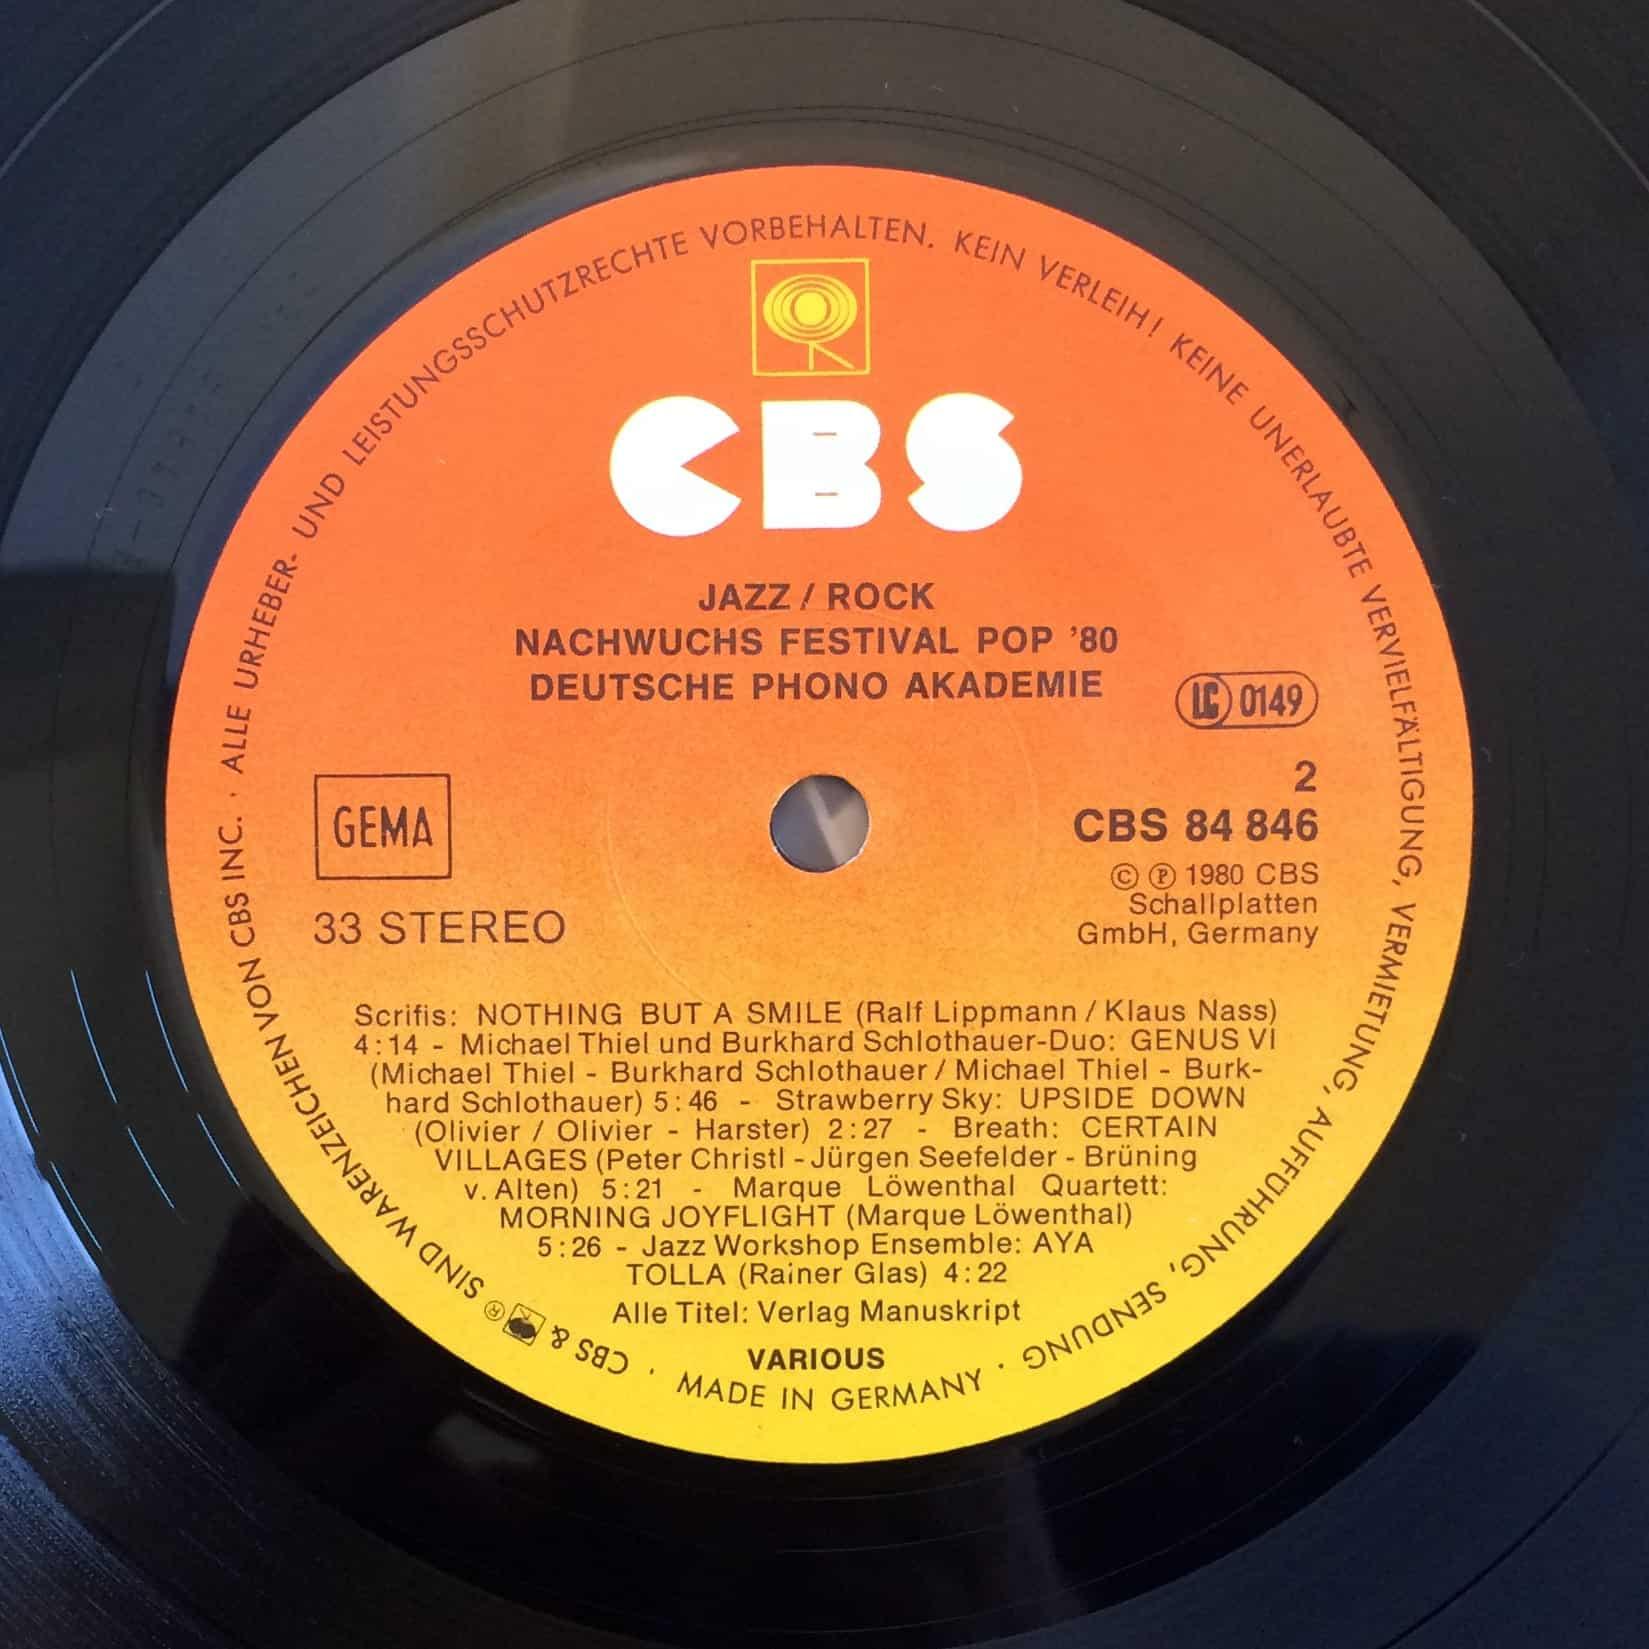 Jazz, Rock - Nachwuchs Festival Pop '80